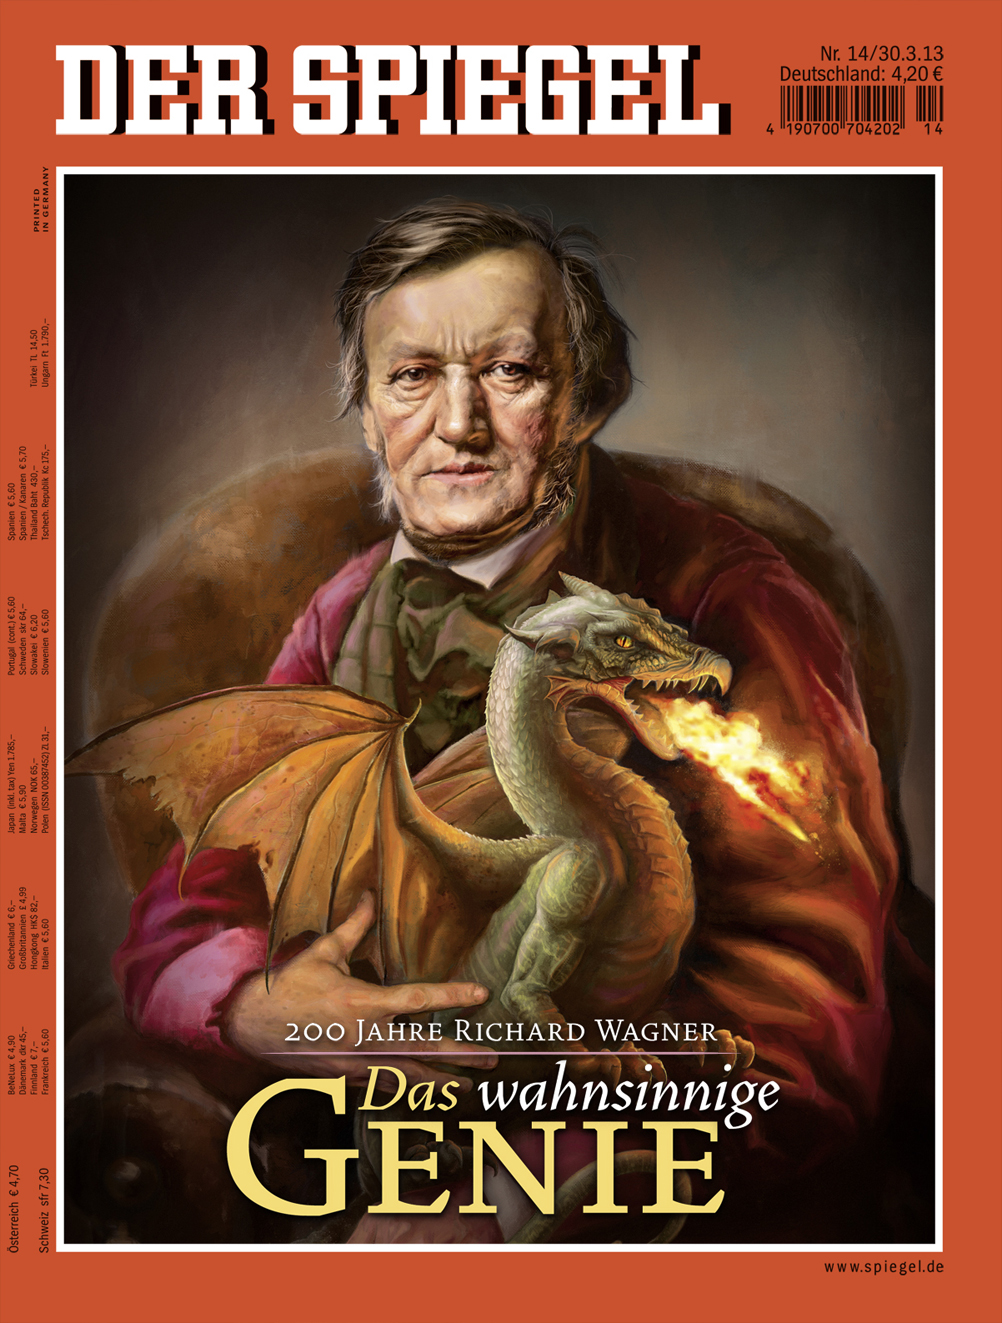 Wagner for der spiegel jason seiler illustrationjason for Der spiegel redakteure